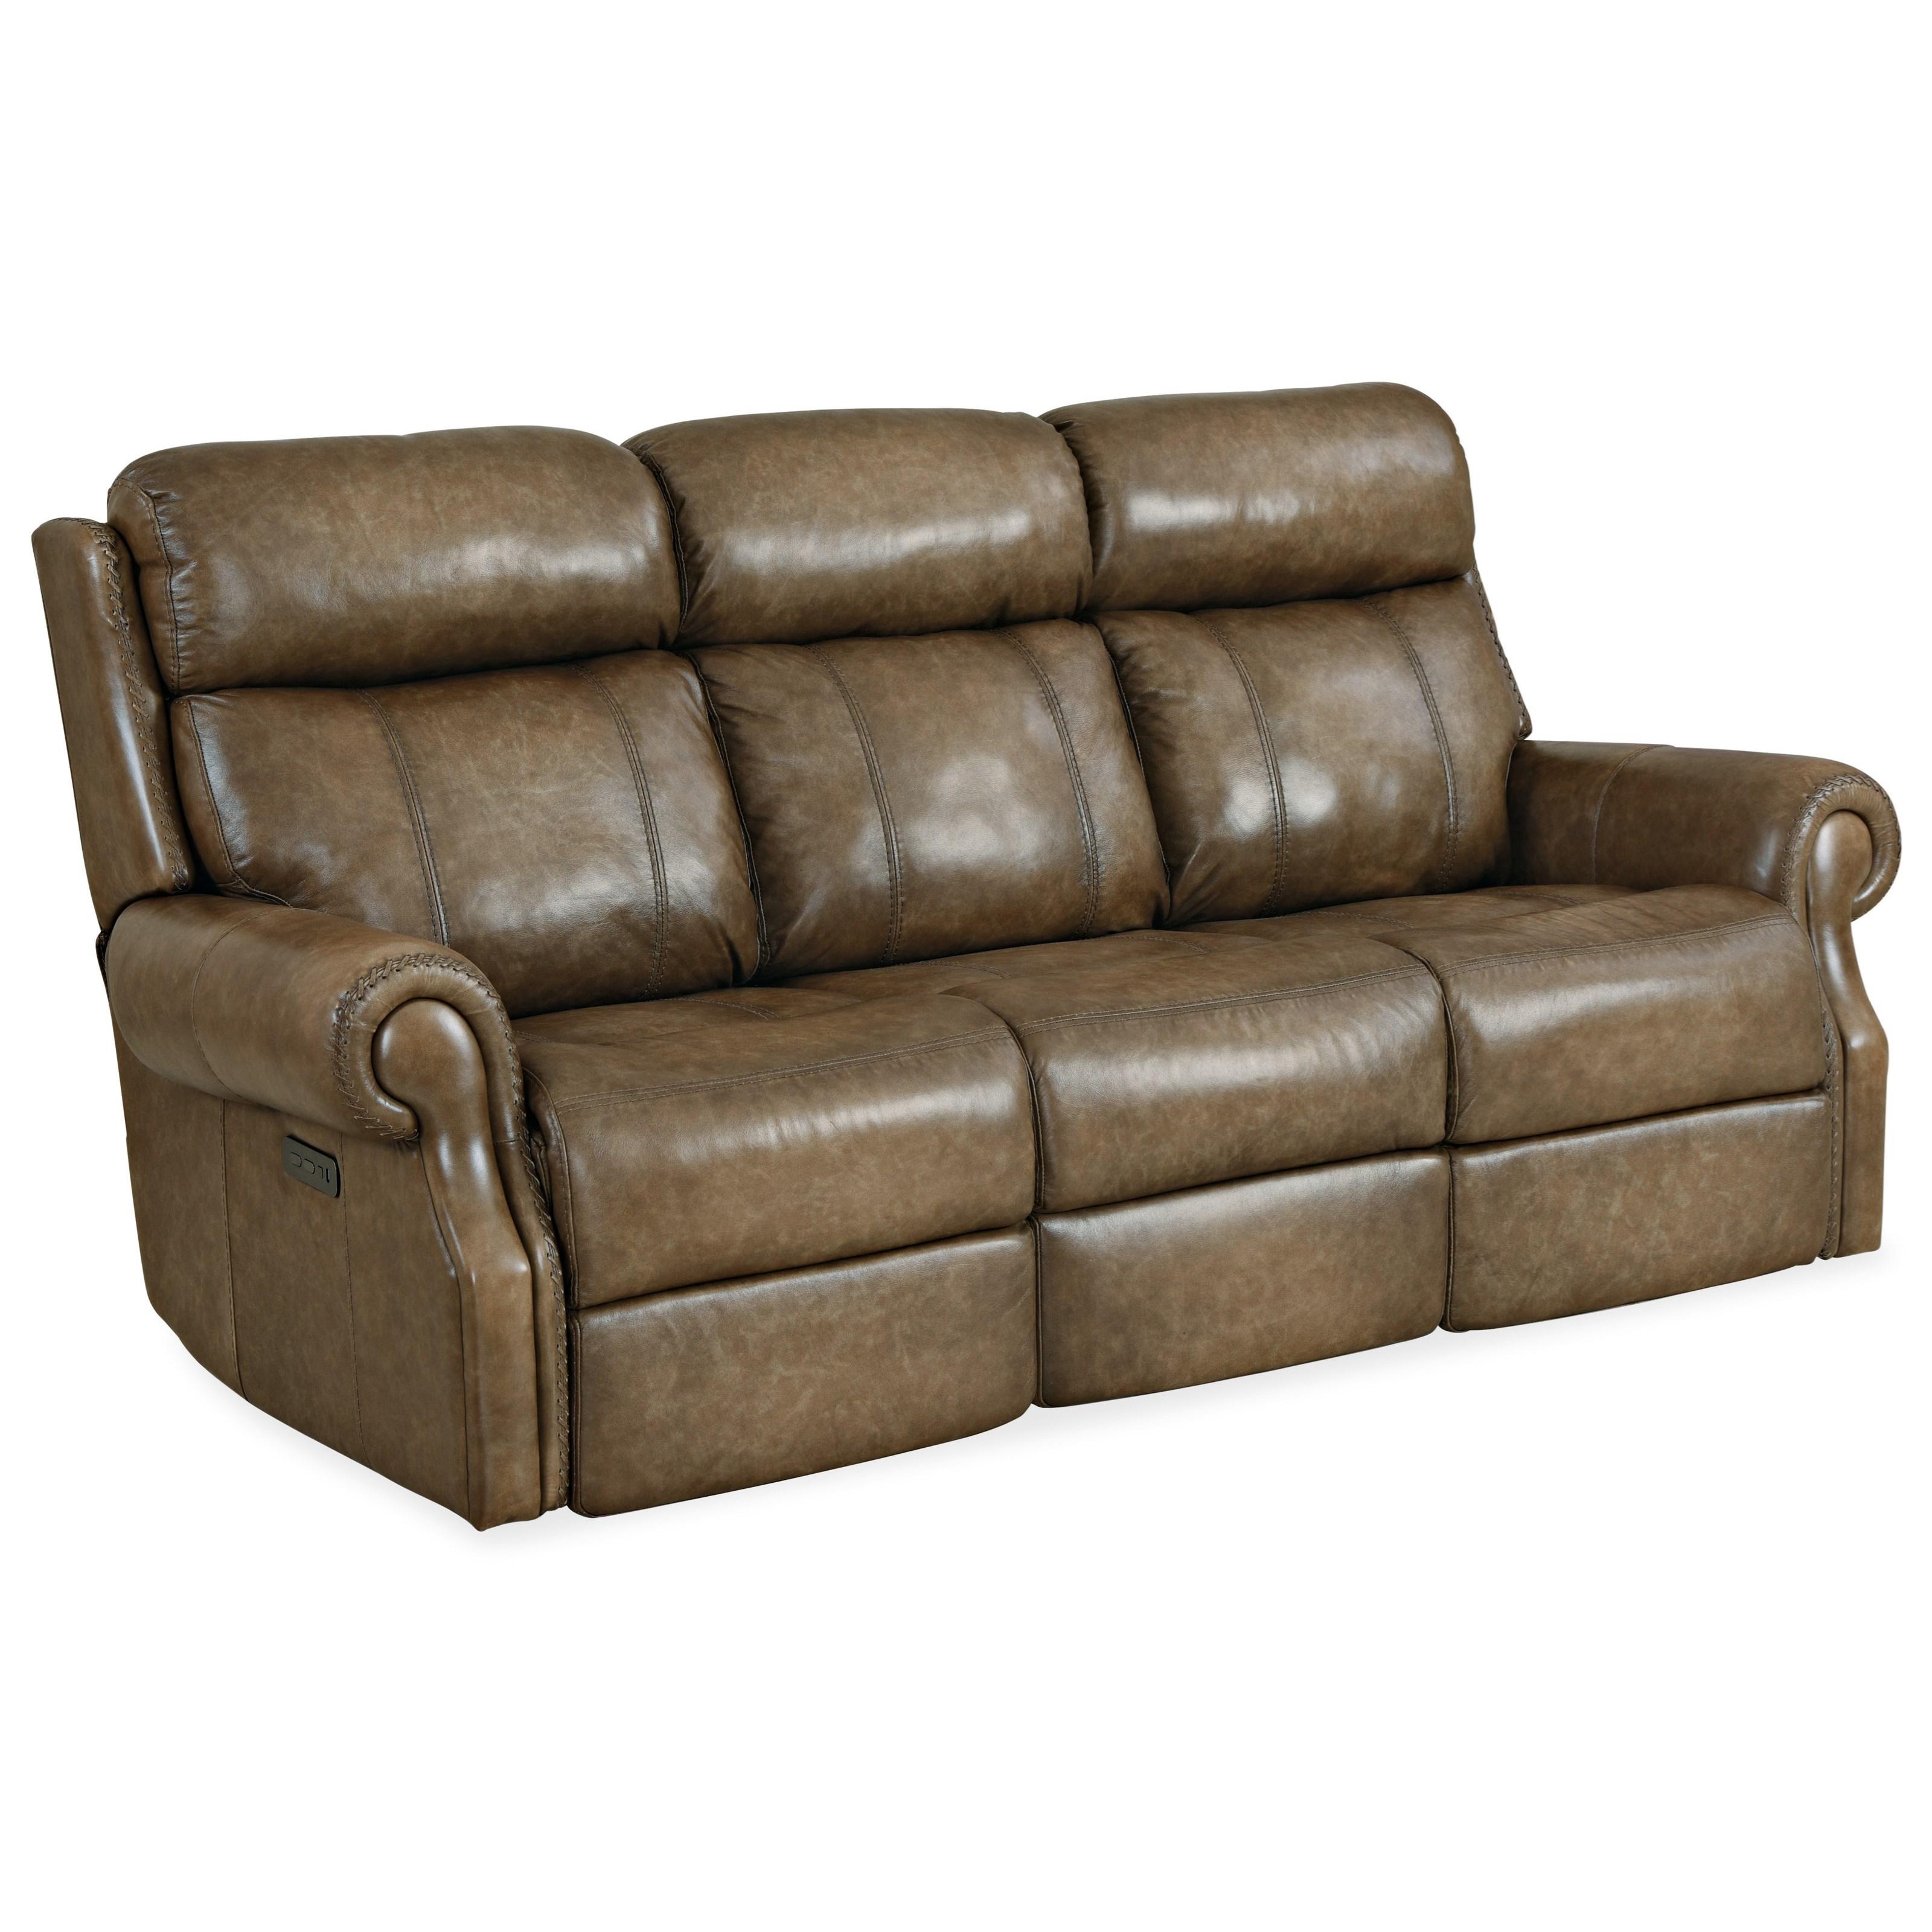 Brooks Power Sofa w/ Power Headrest by Hooker Furniture at Zak's Home